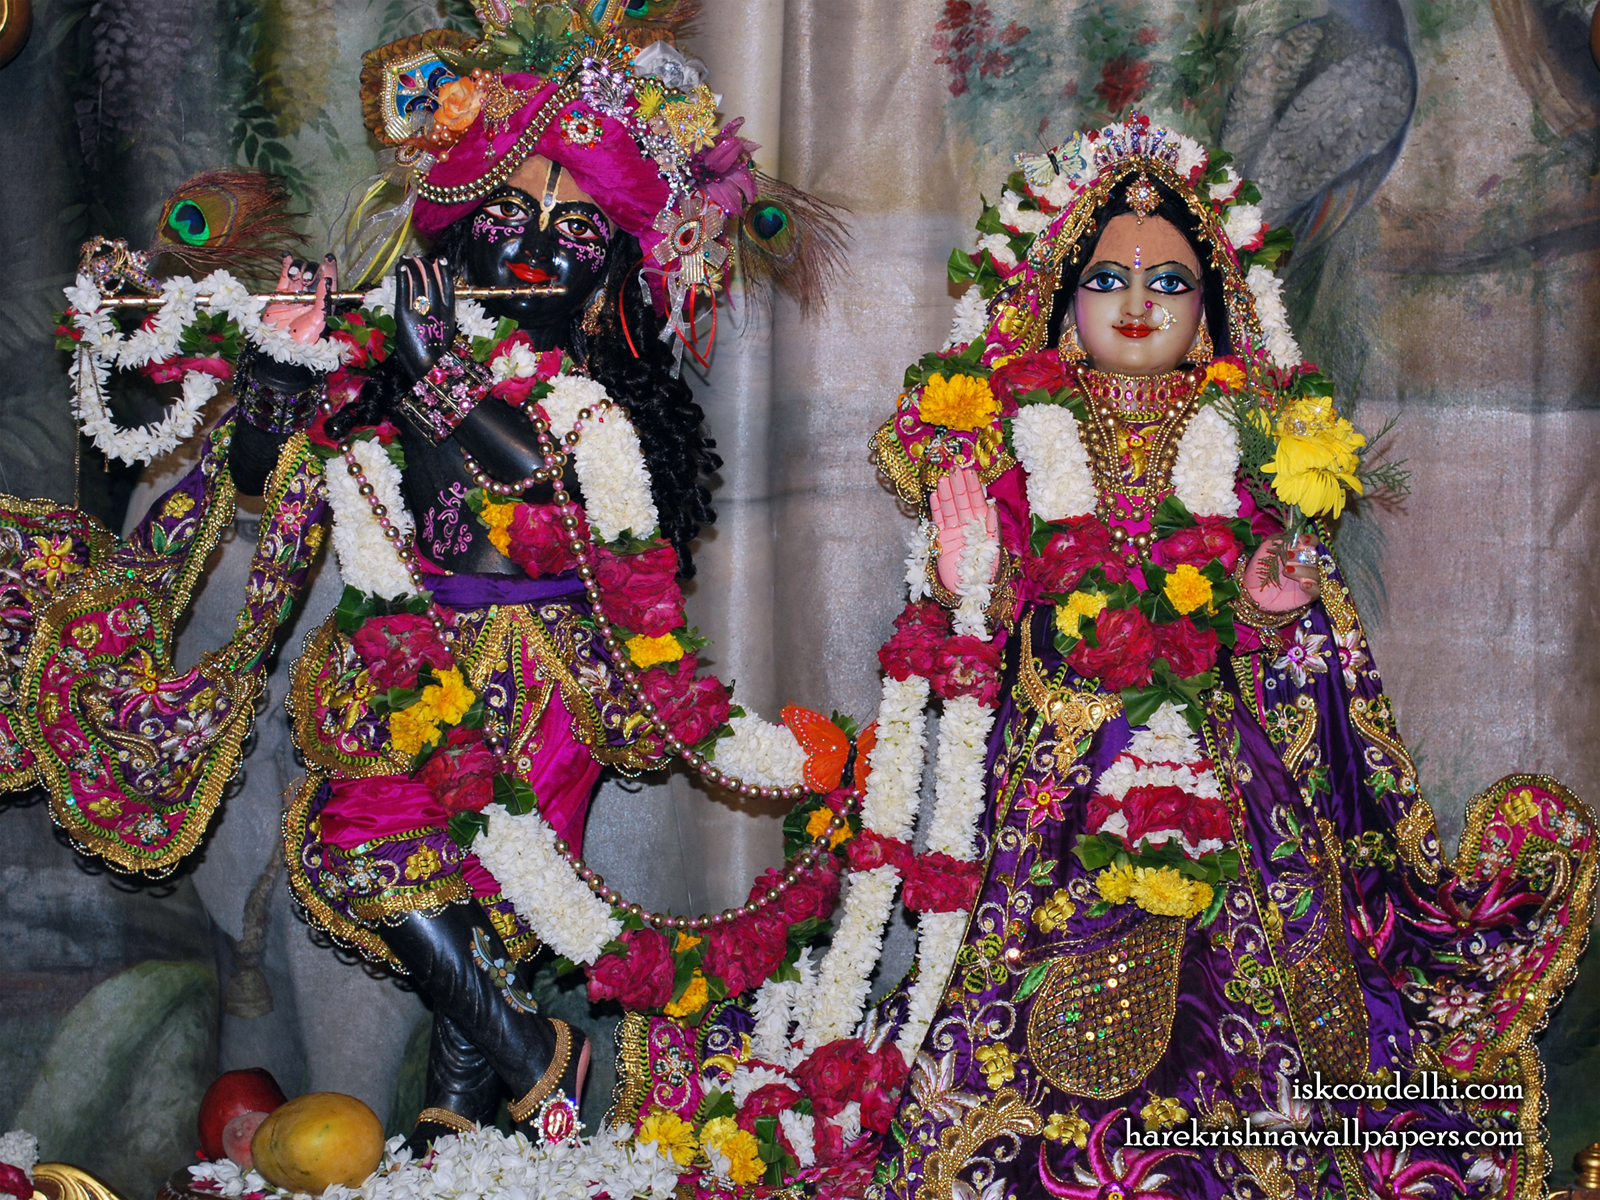 Sri Sri Radha Parthasarathi Wallpaper (002) Size1600x1200 Download